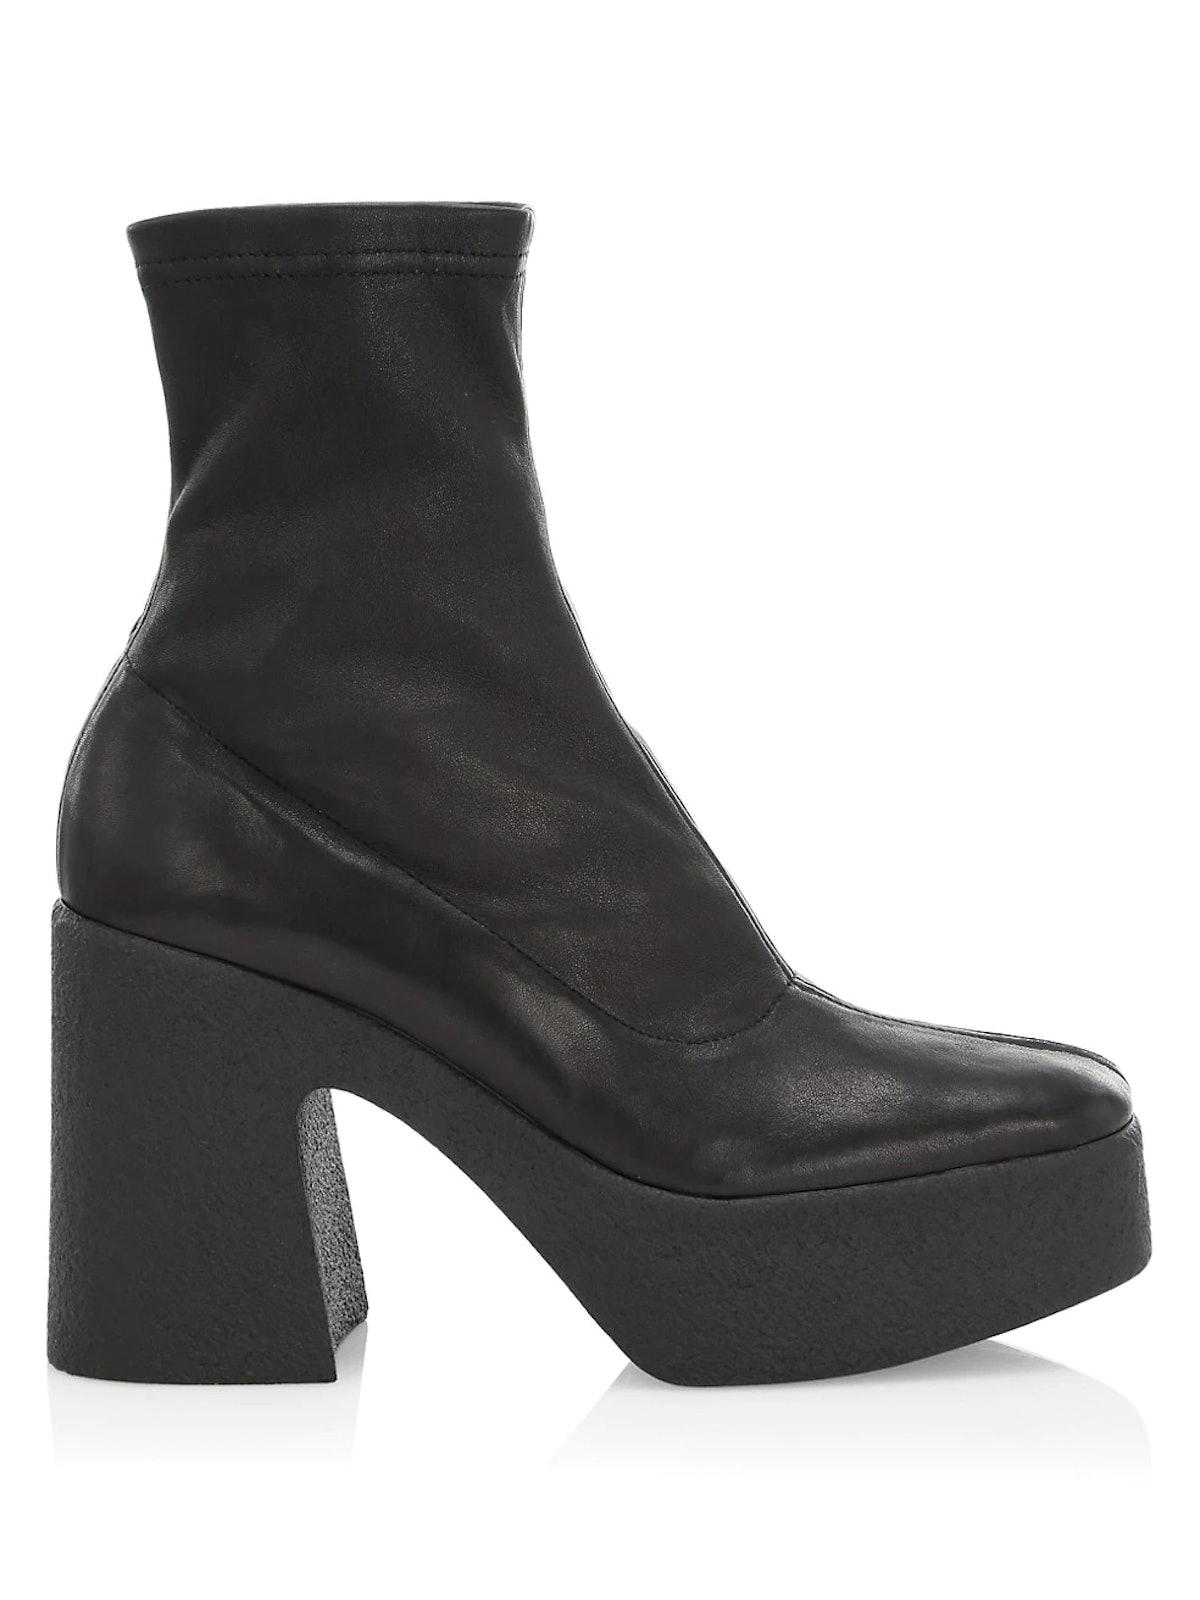 Empire Leather Platform Boots